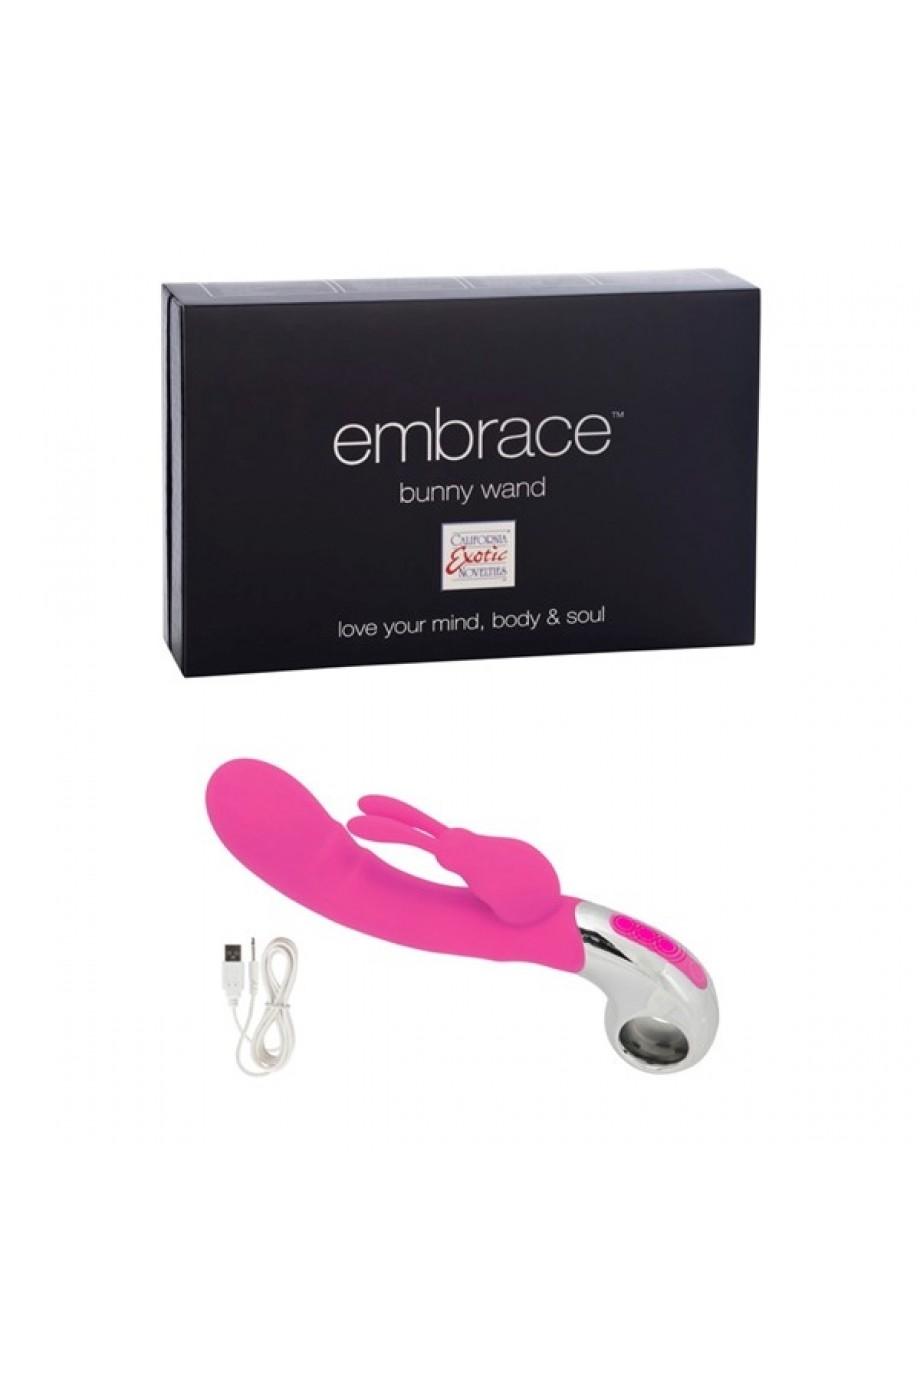 Вибратор Embrace Bunny Wand - Pink розовый